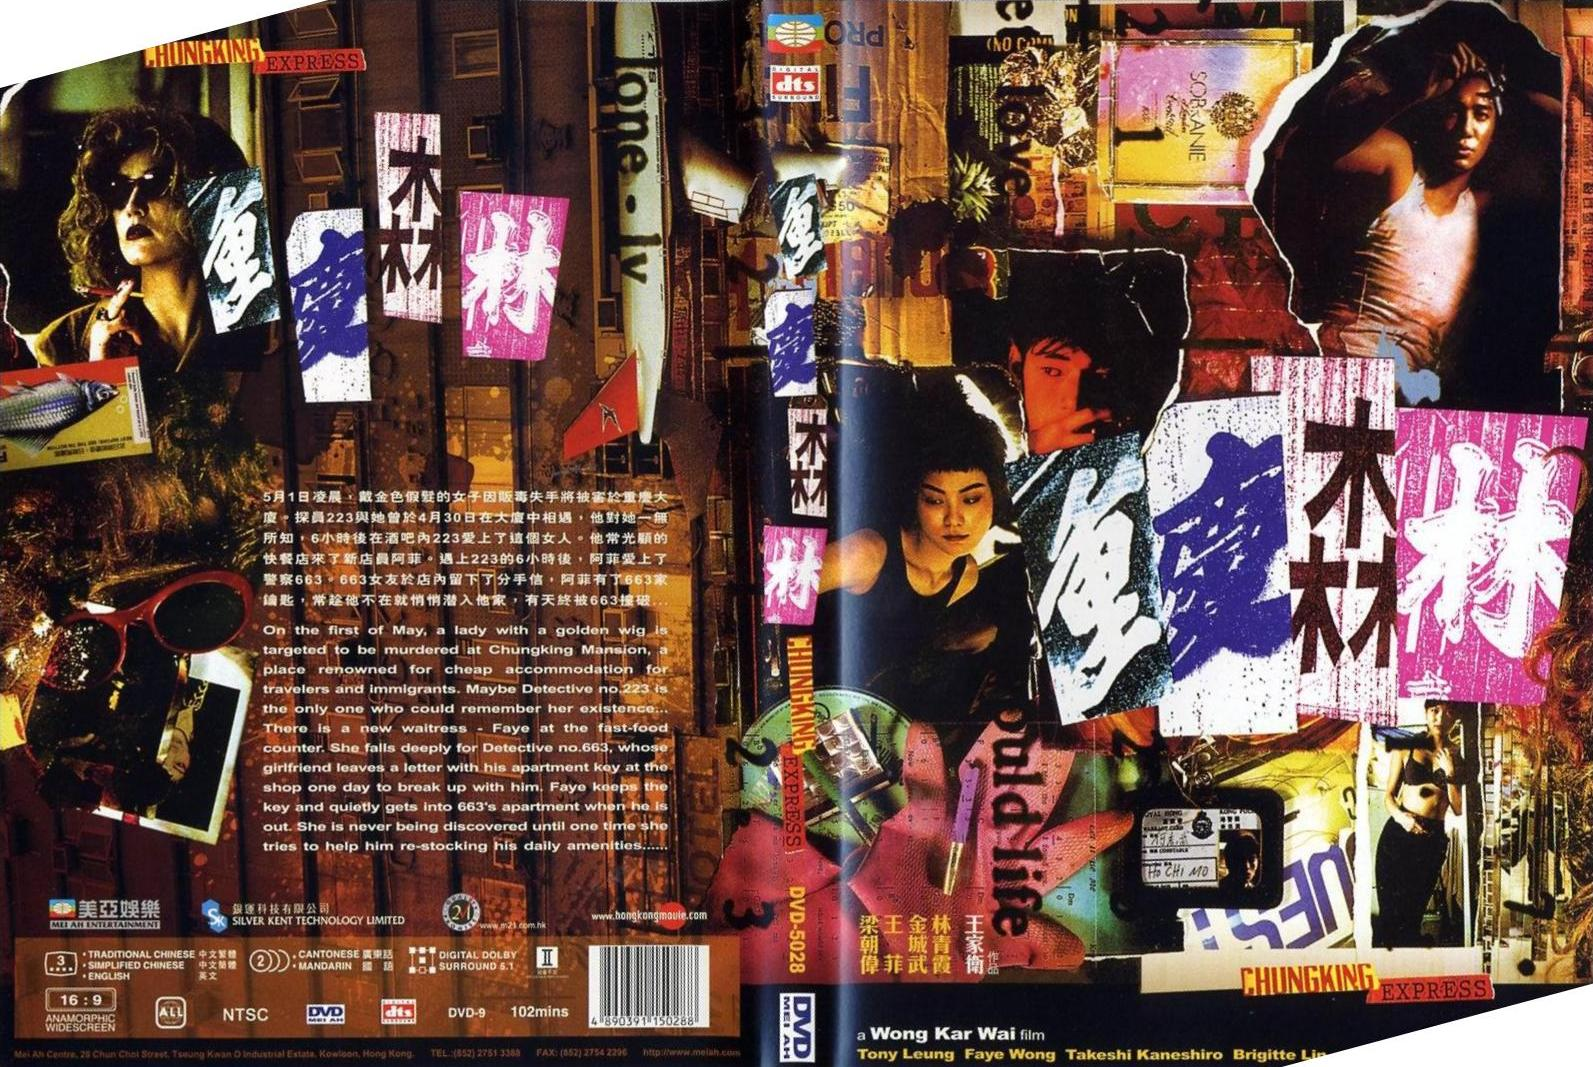 Chungking Express _disc jacket